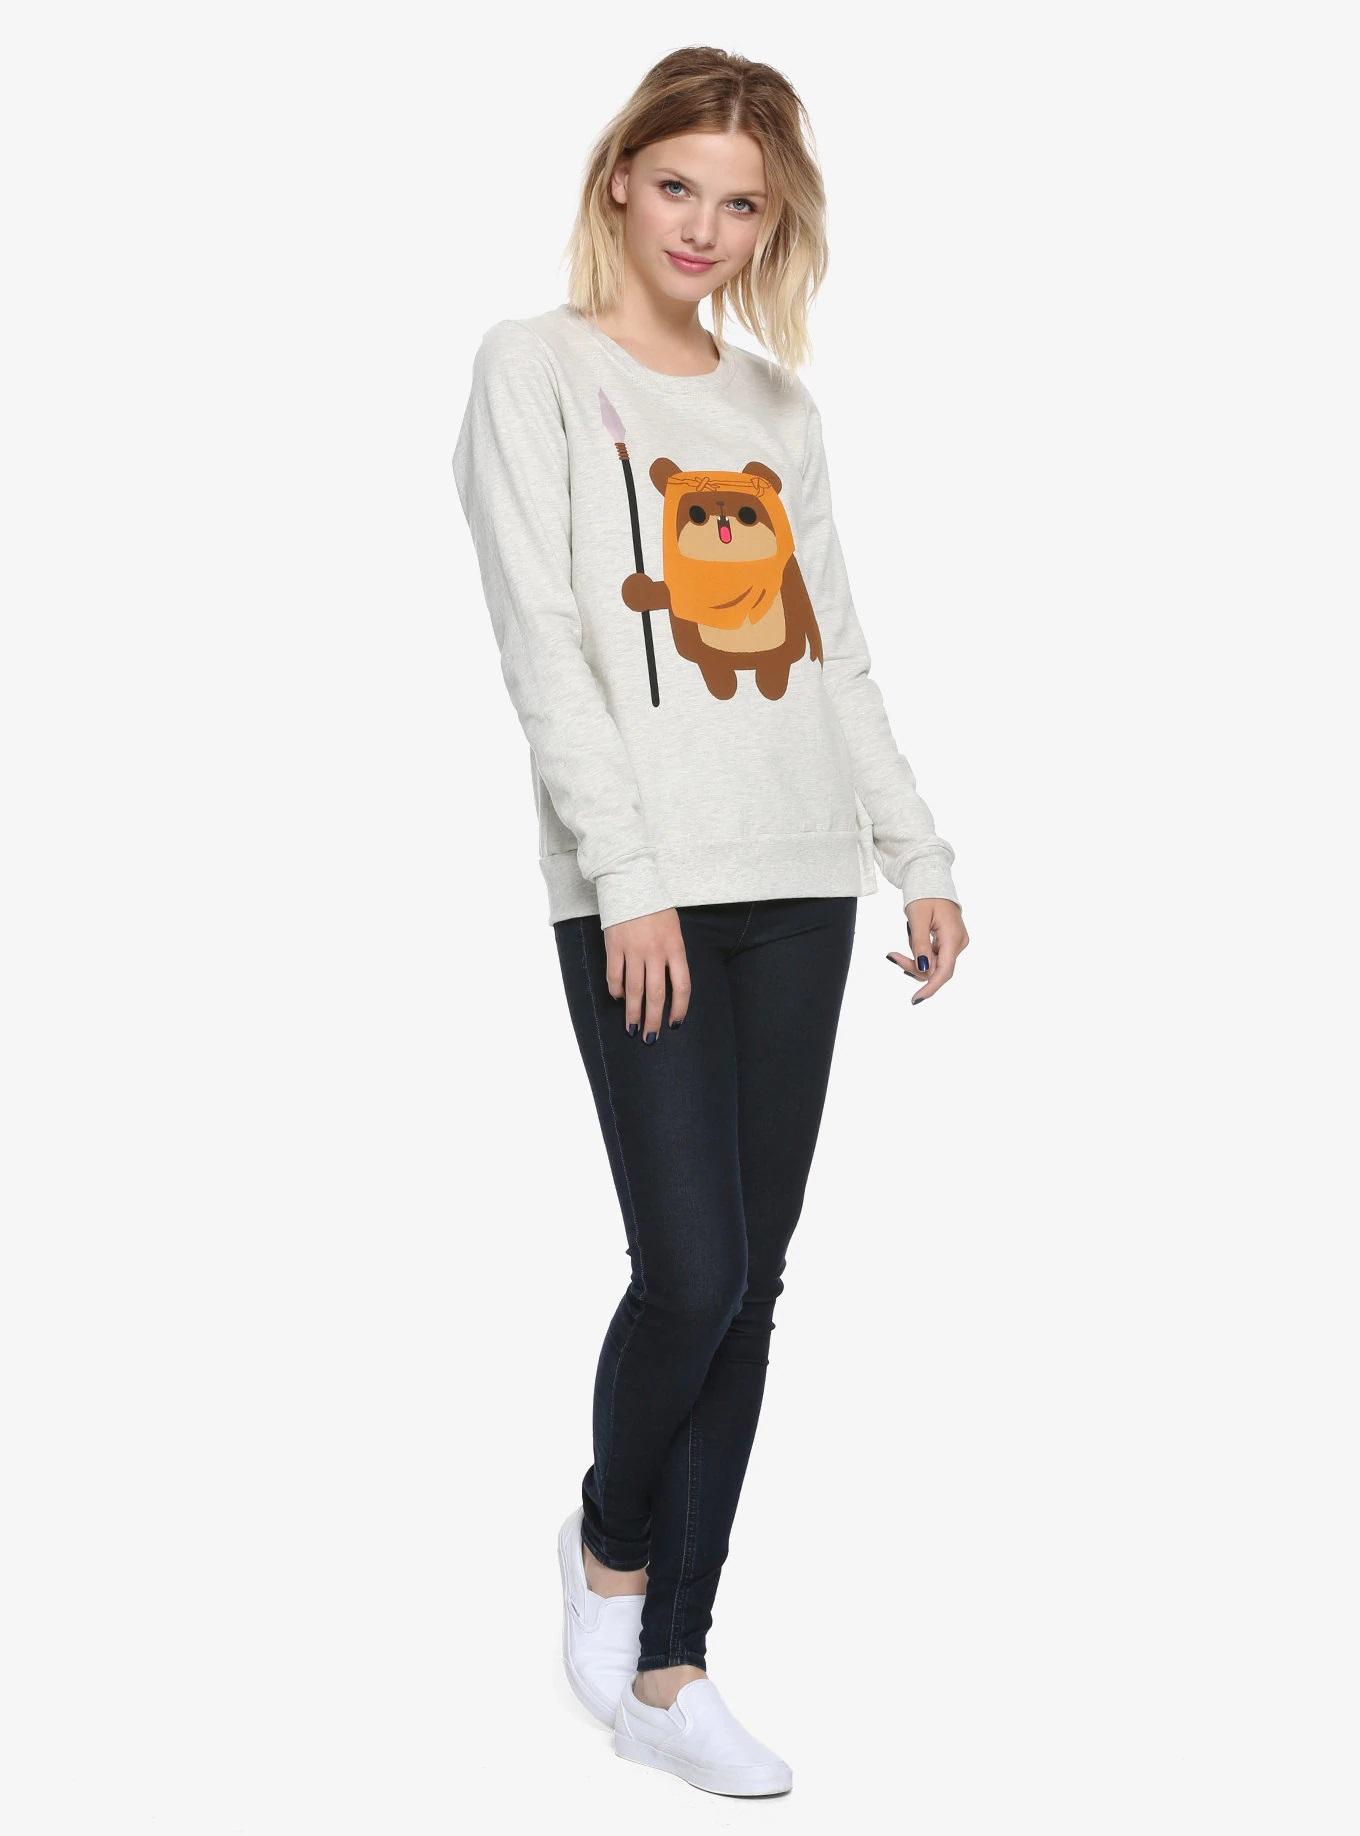 Women's Her Universe x Star Wars Chibi Ewok Sweatshirt